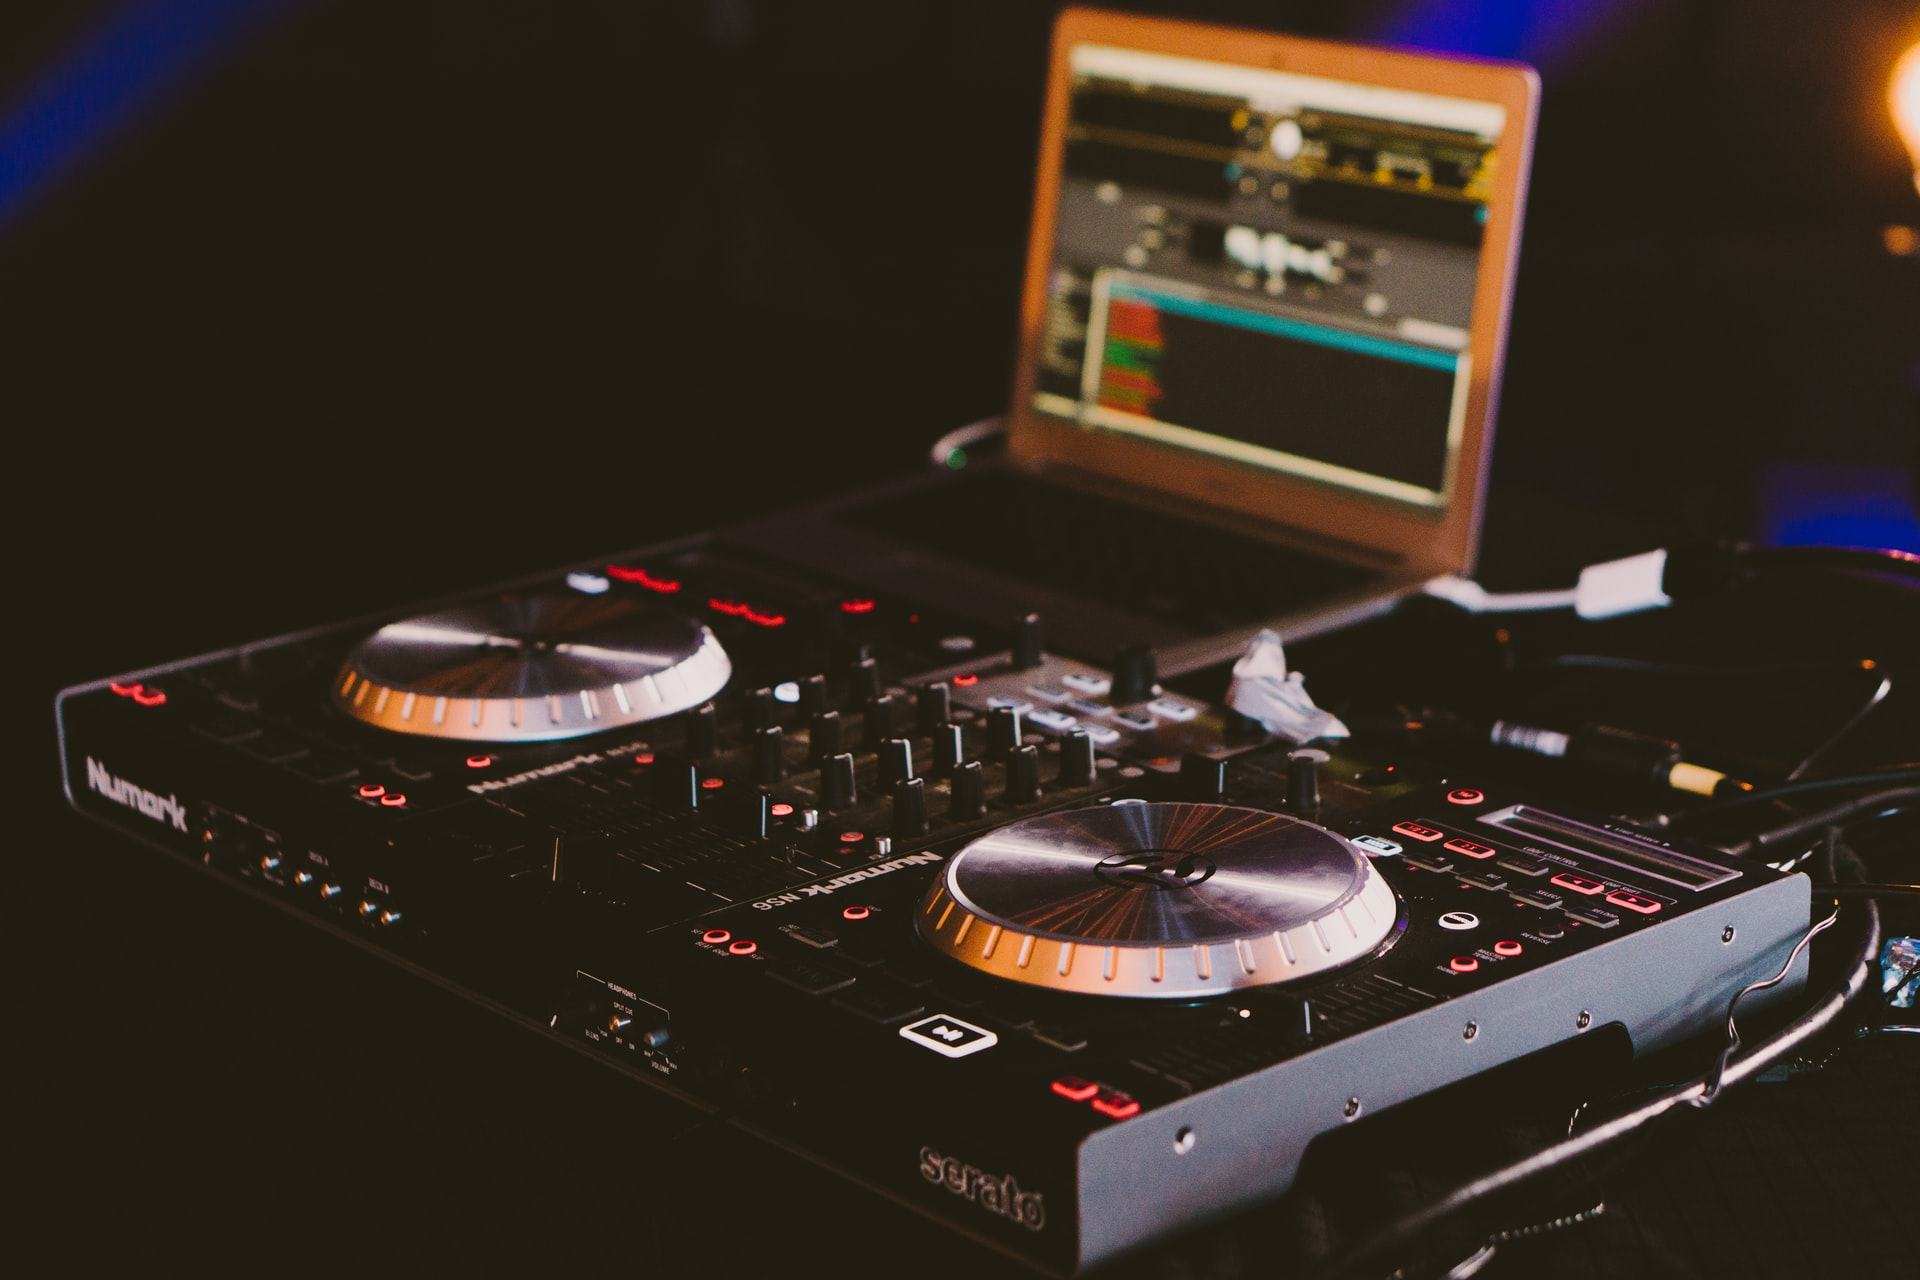 Dj streaming music online